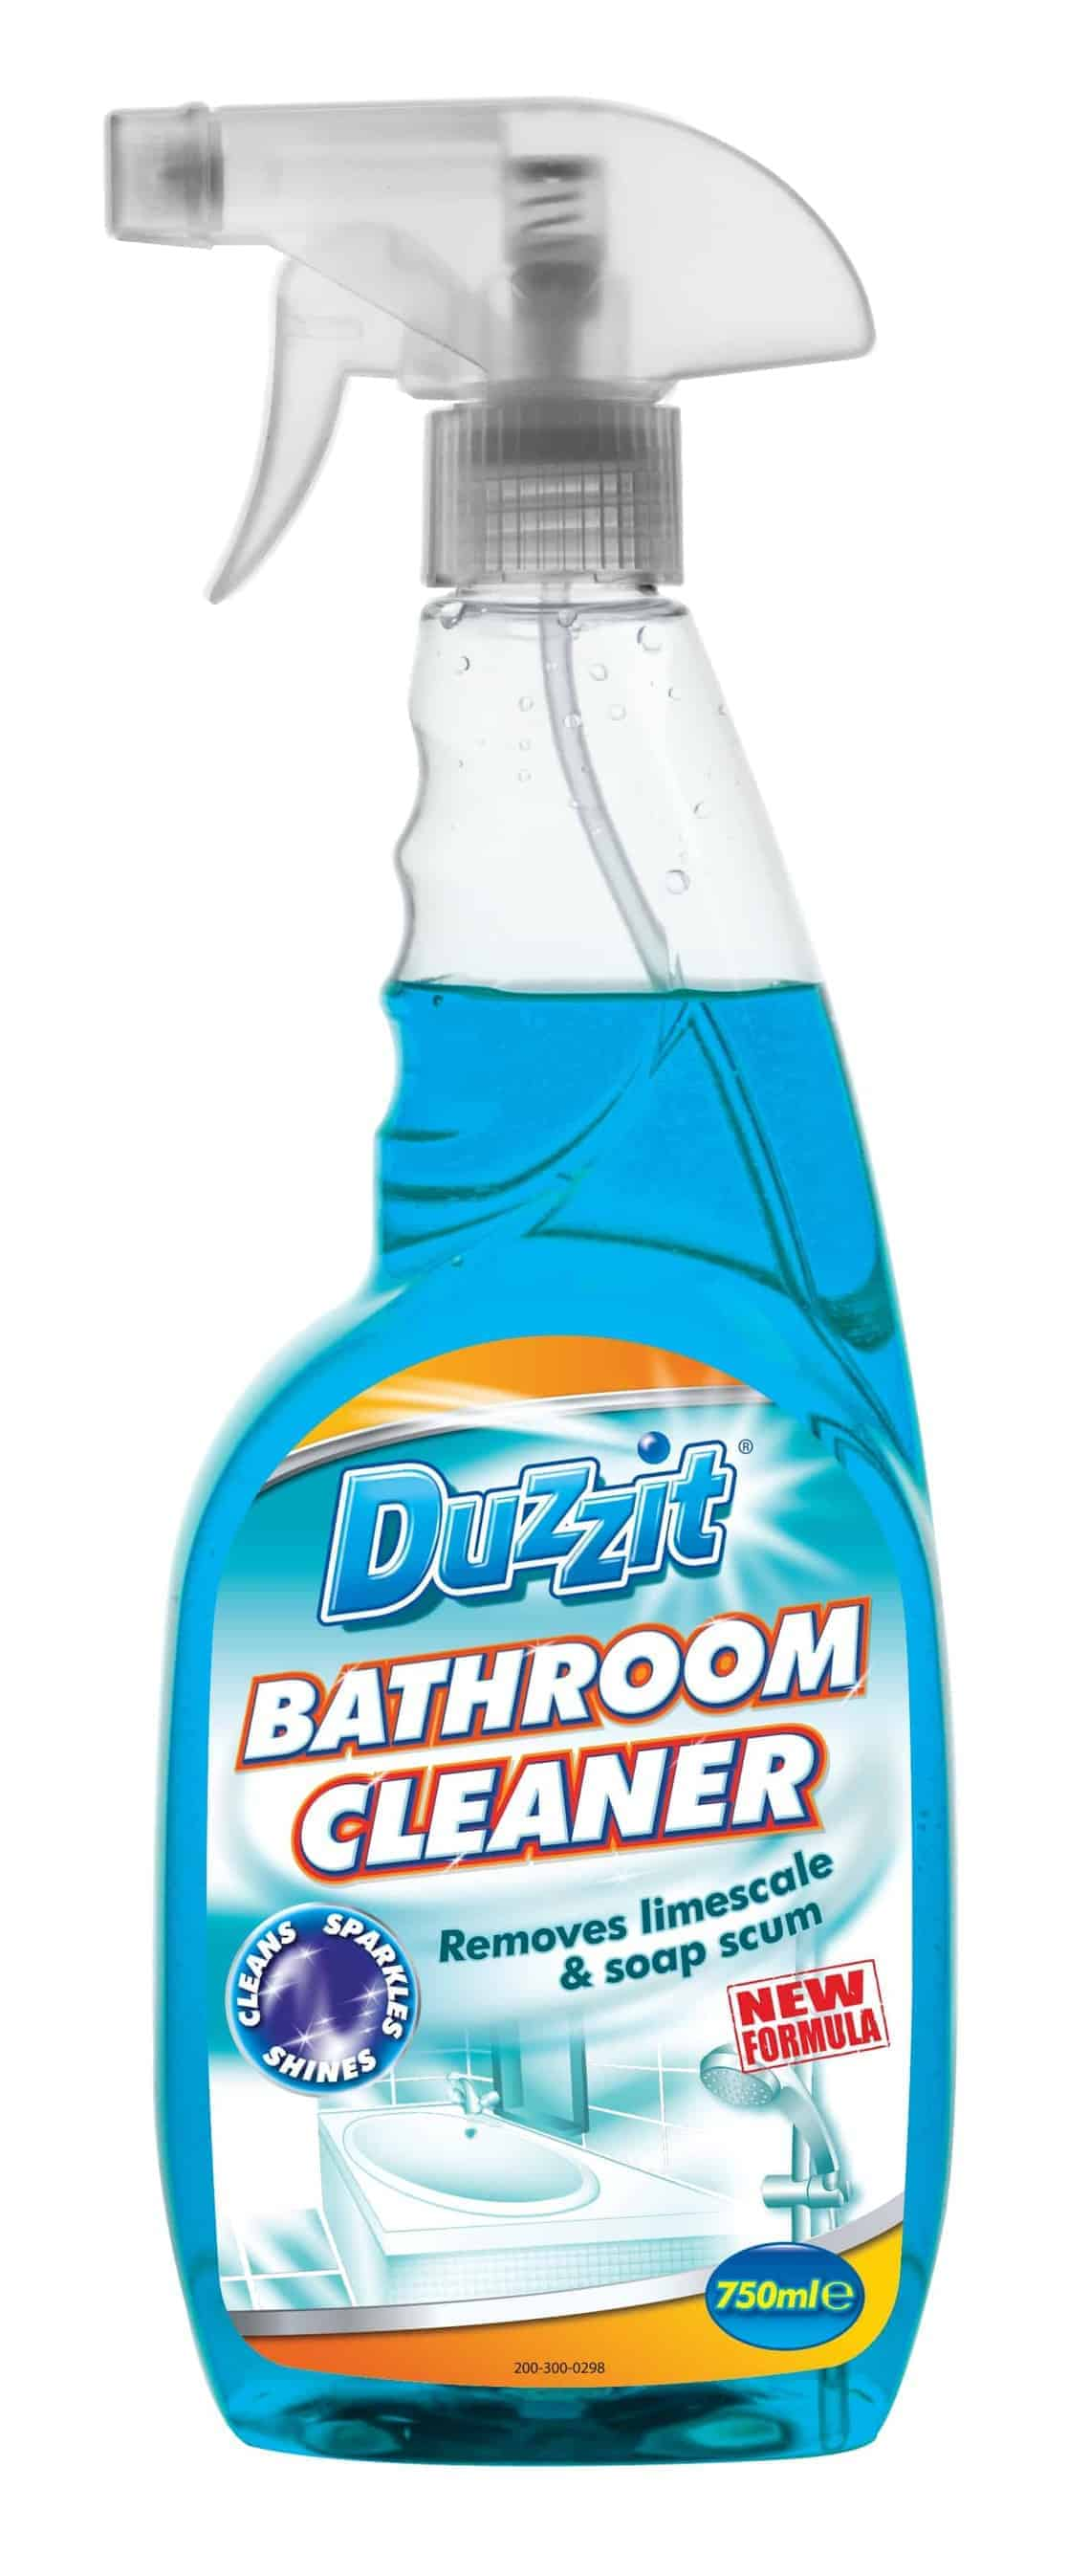 Duzzit 750ml Bathroom Cleaner